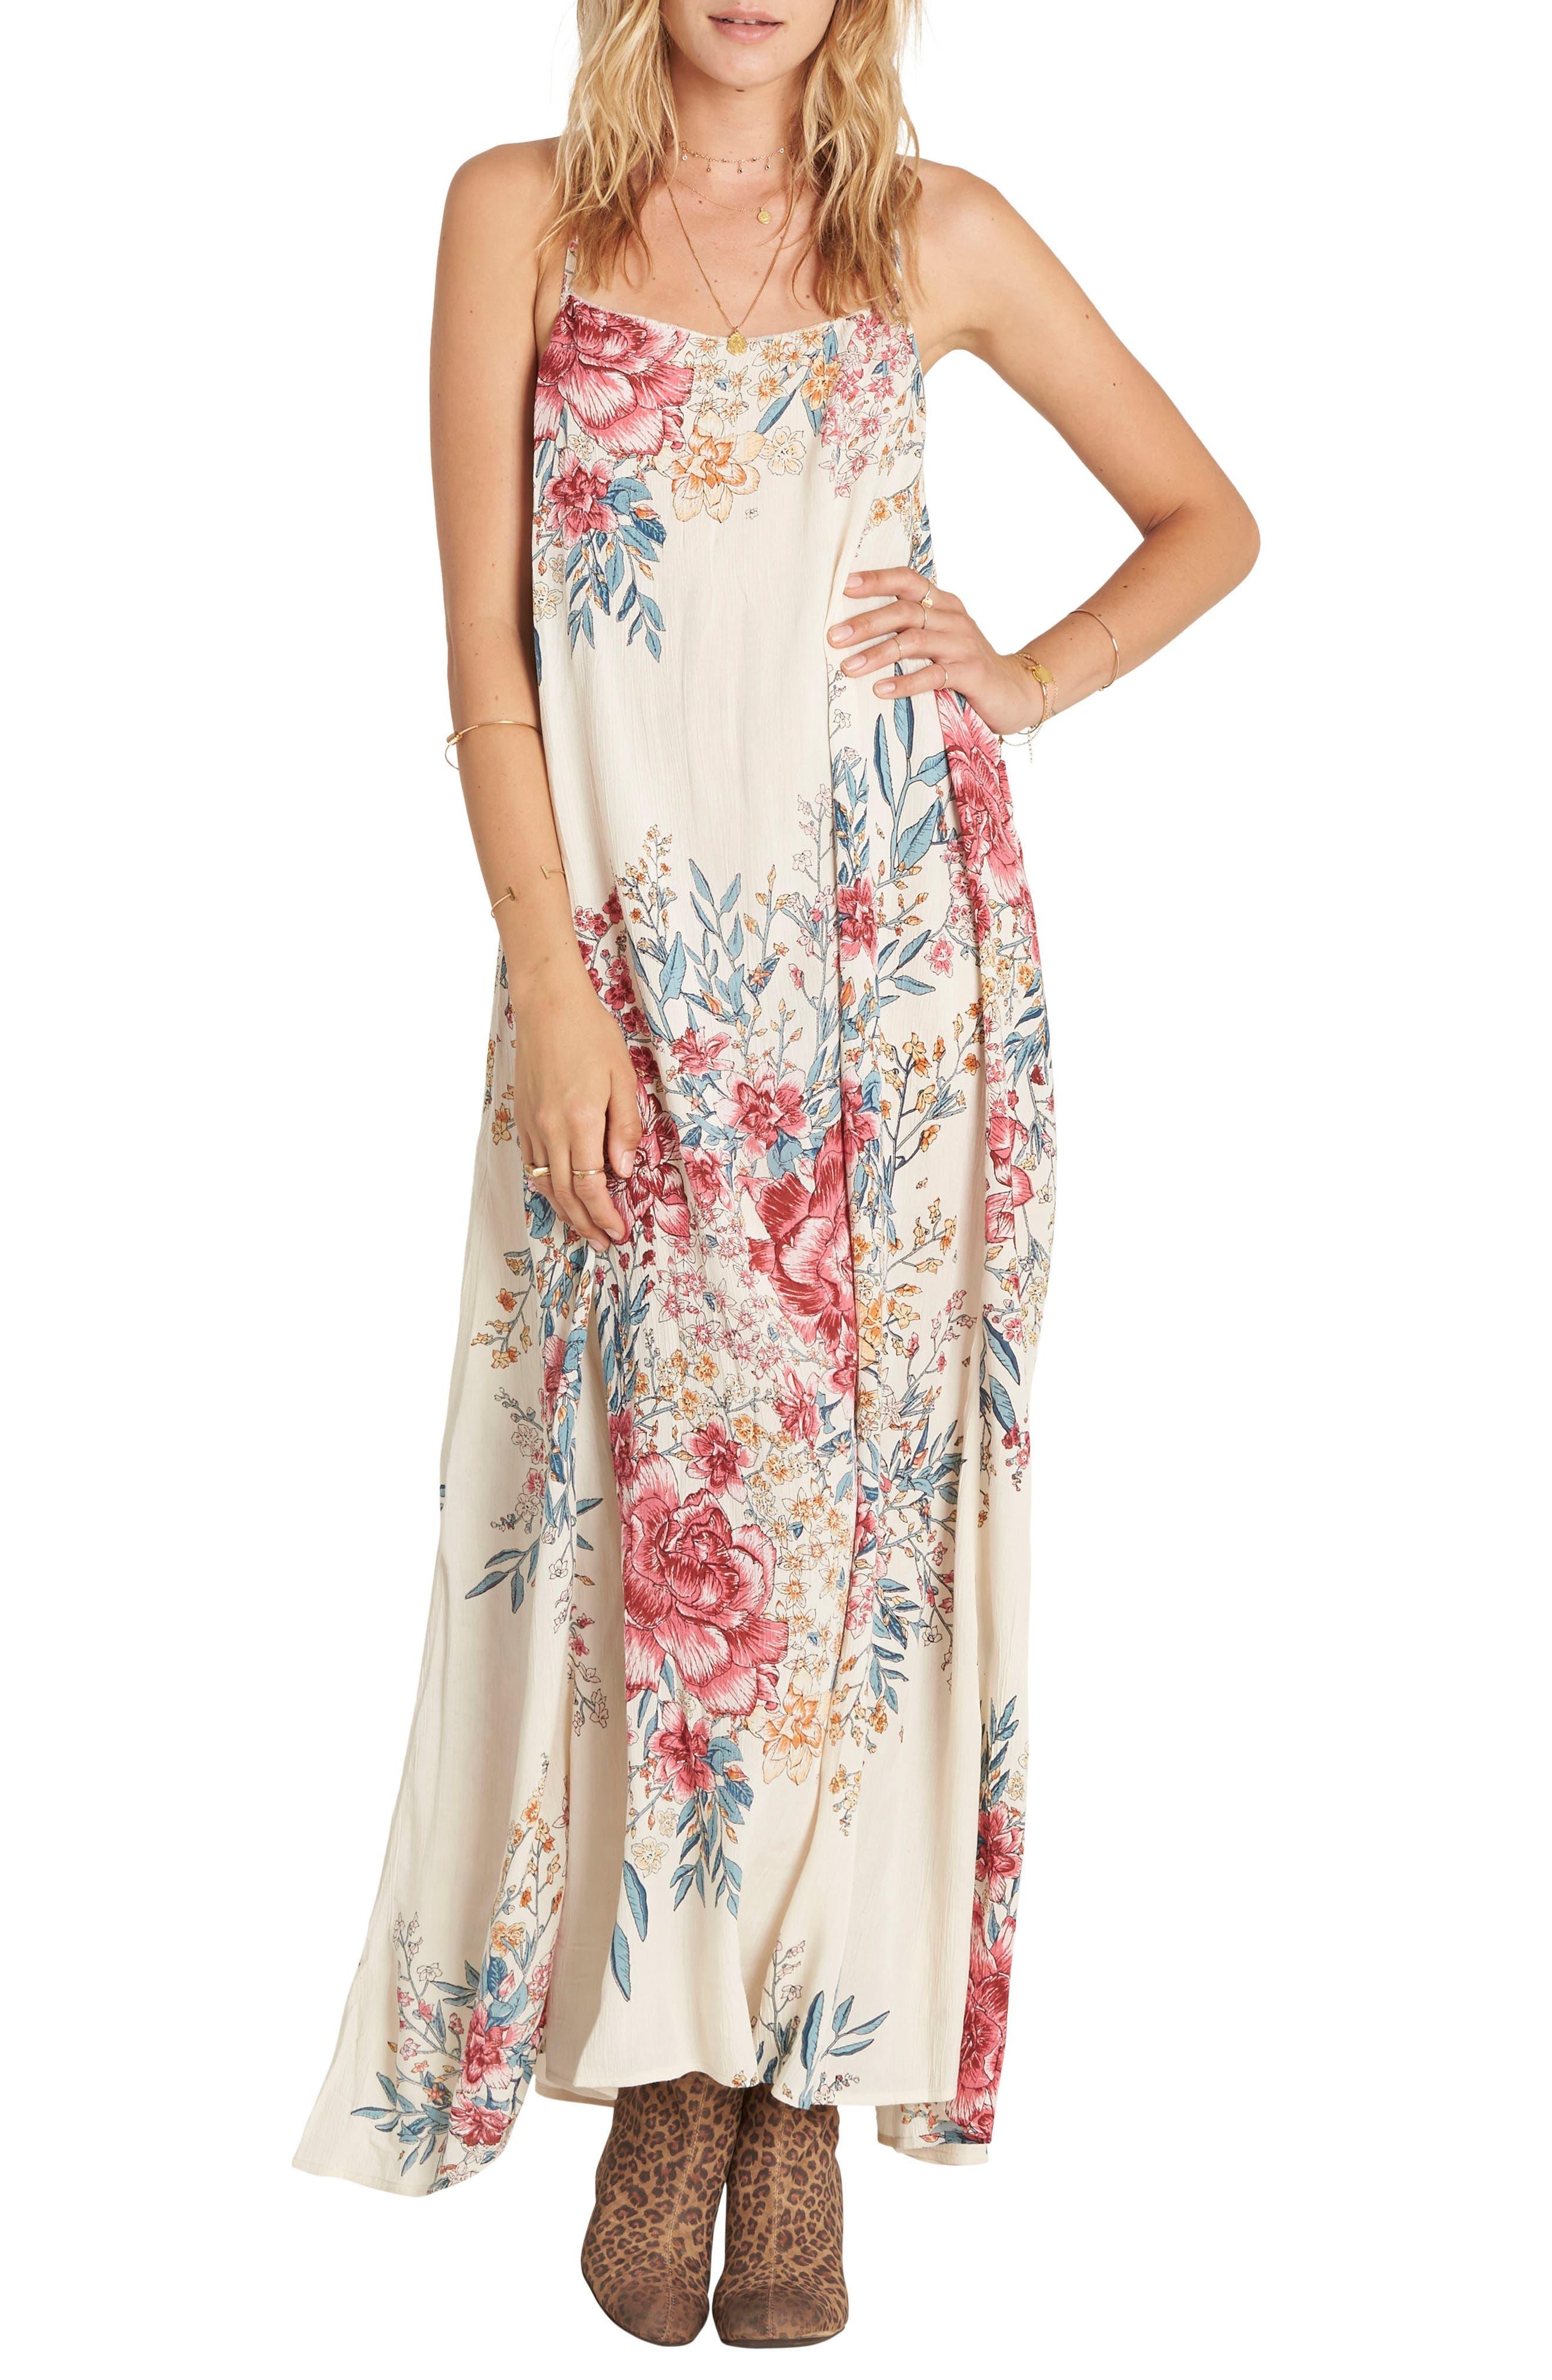 San Sebonne Floral Print Maxi Dress,                             Main thumbnail 1, color,                             Ivory